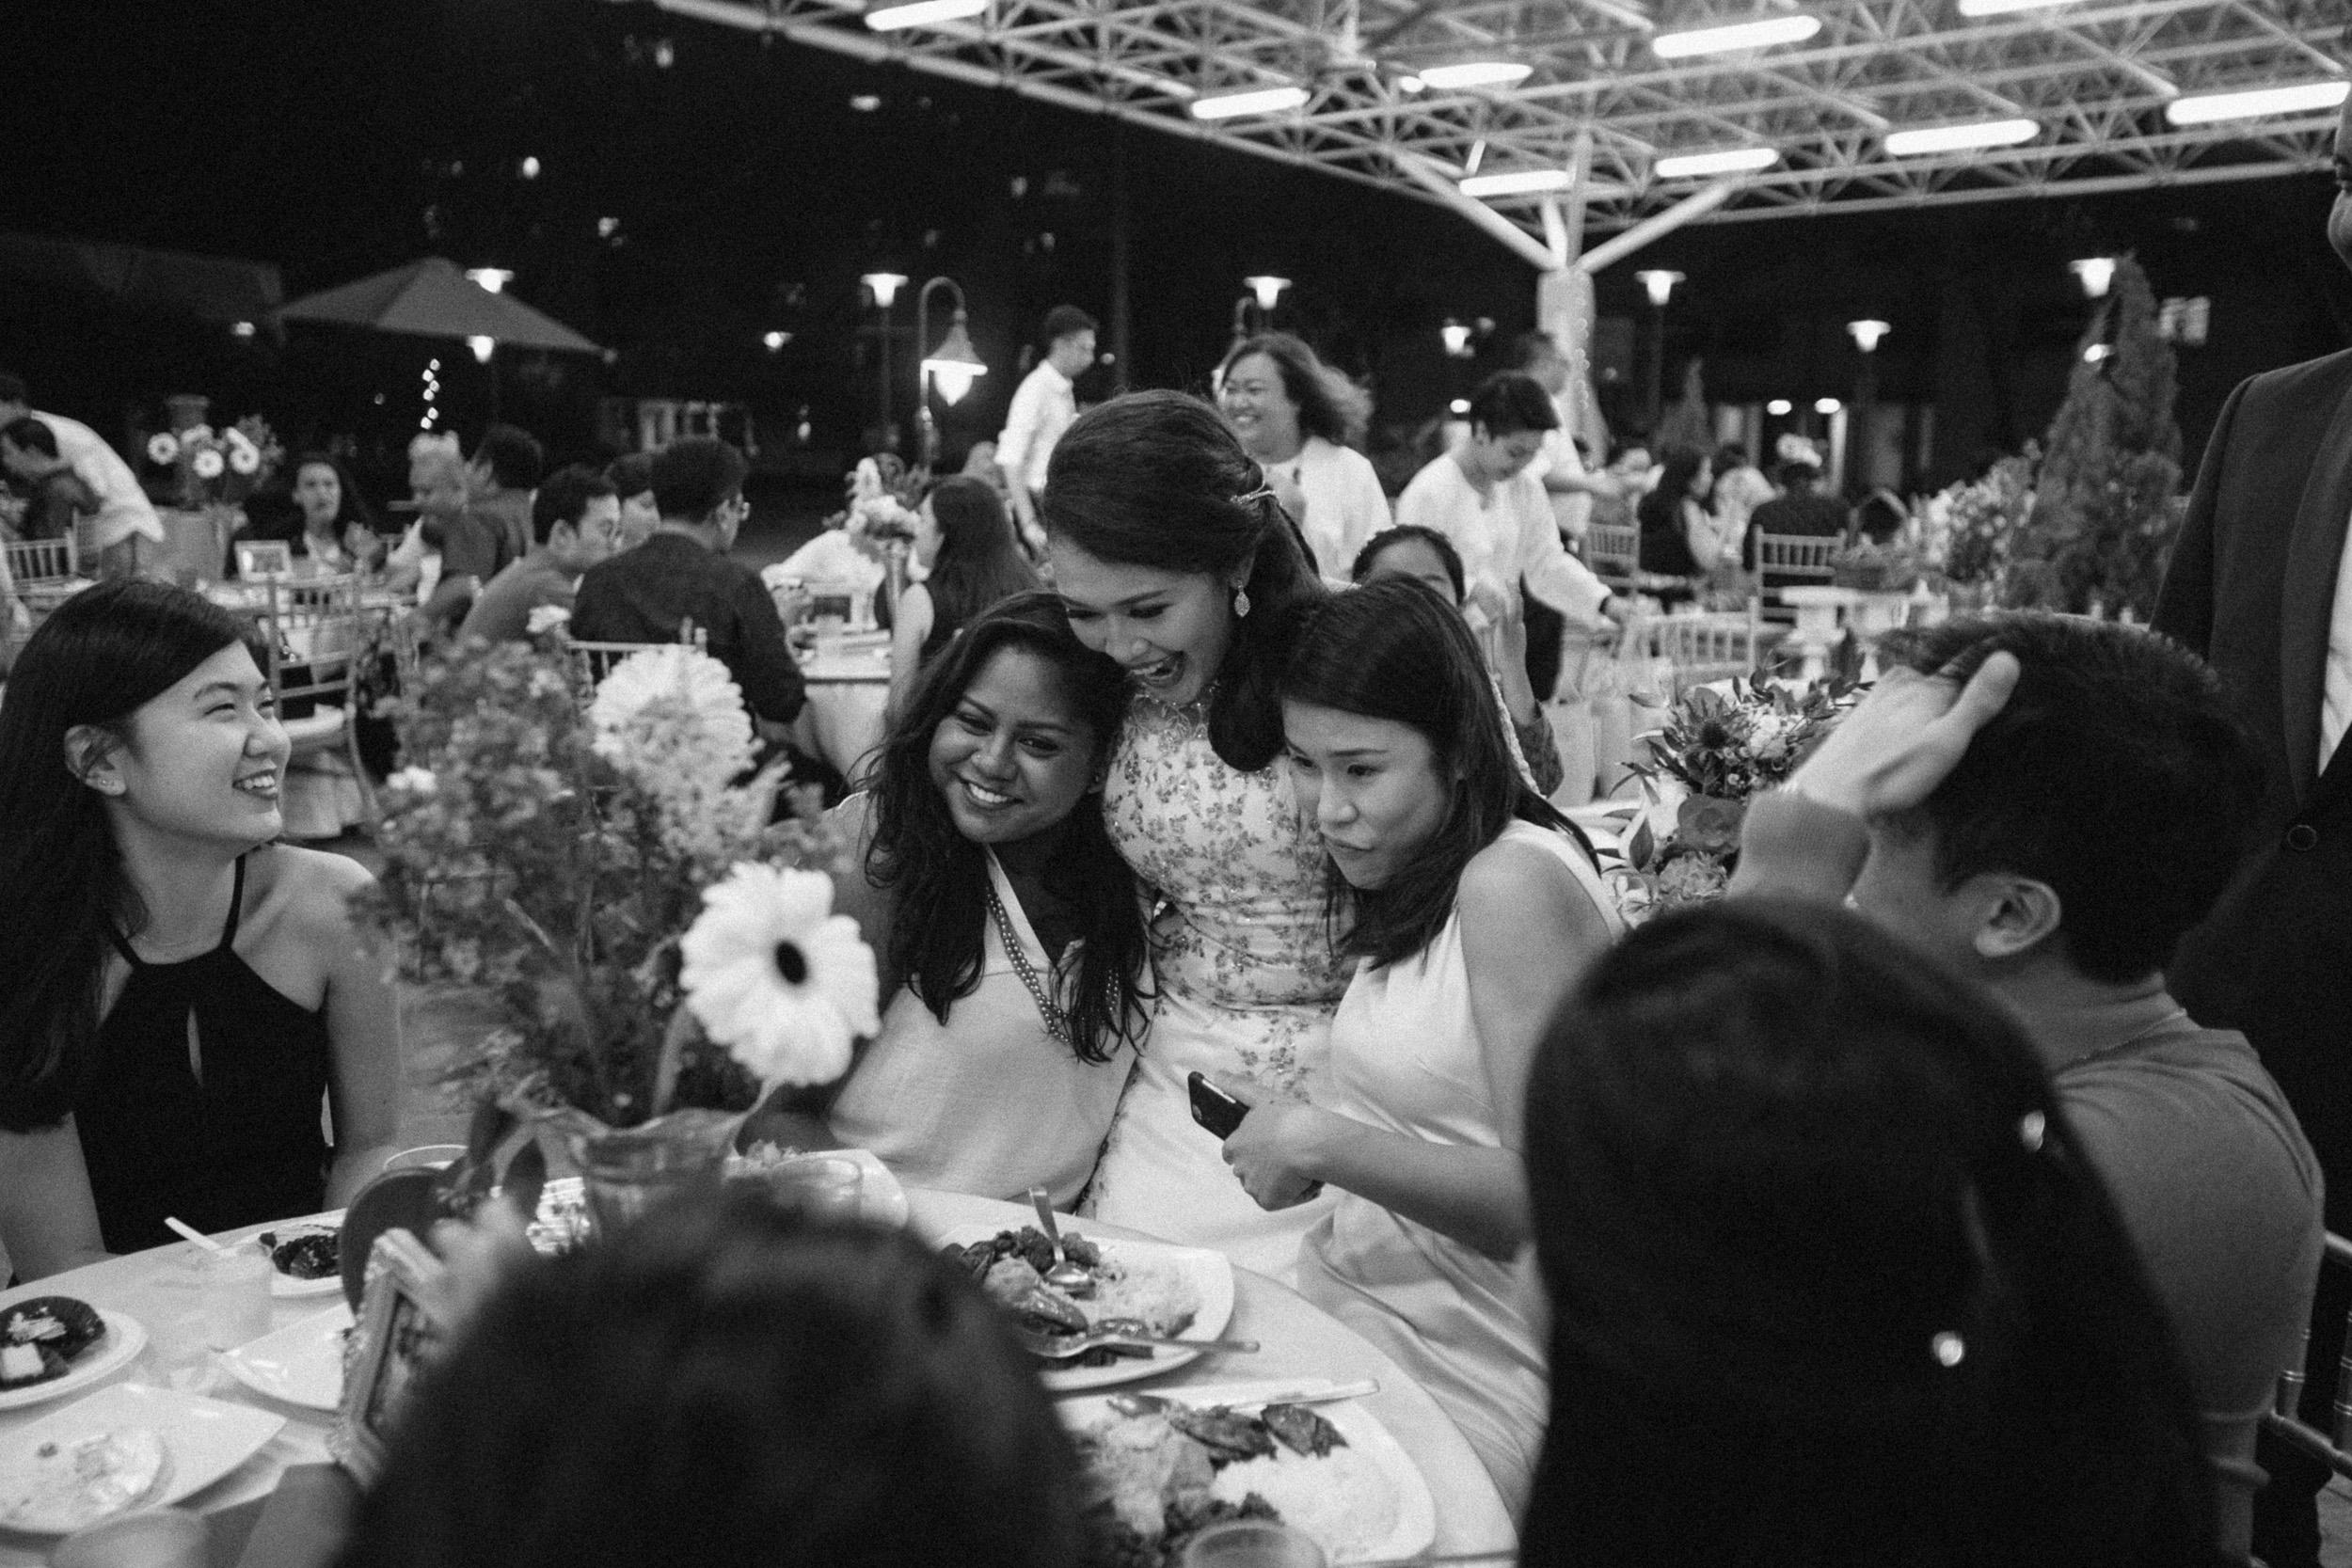 singapore-wedding-photographer-photography-wmt2017-017.jpg